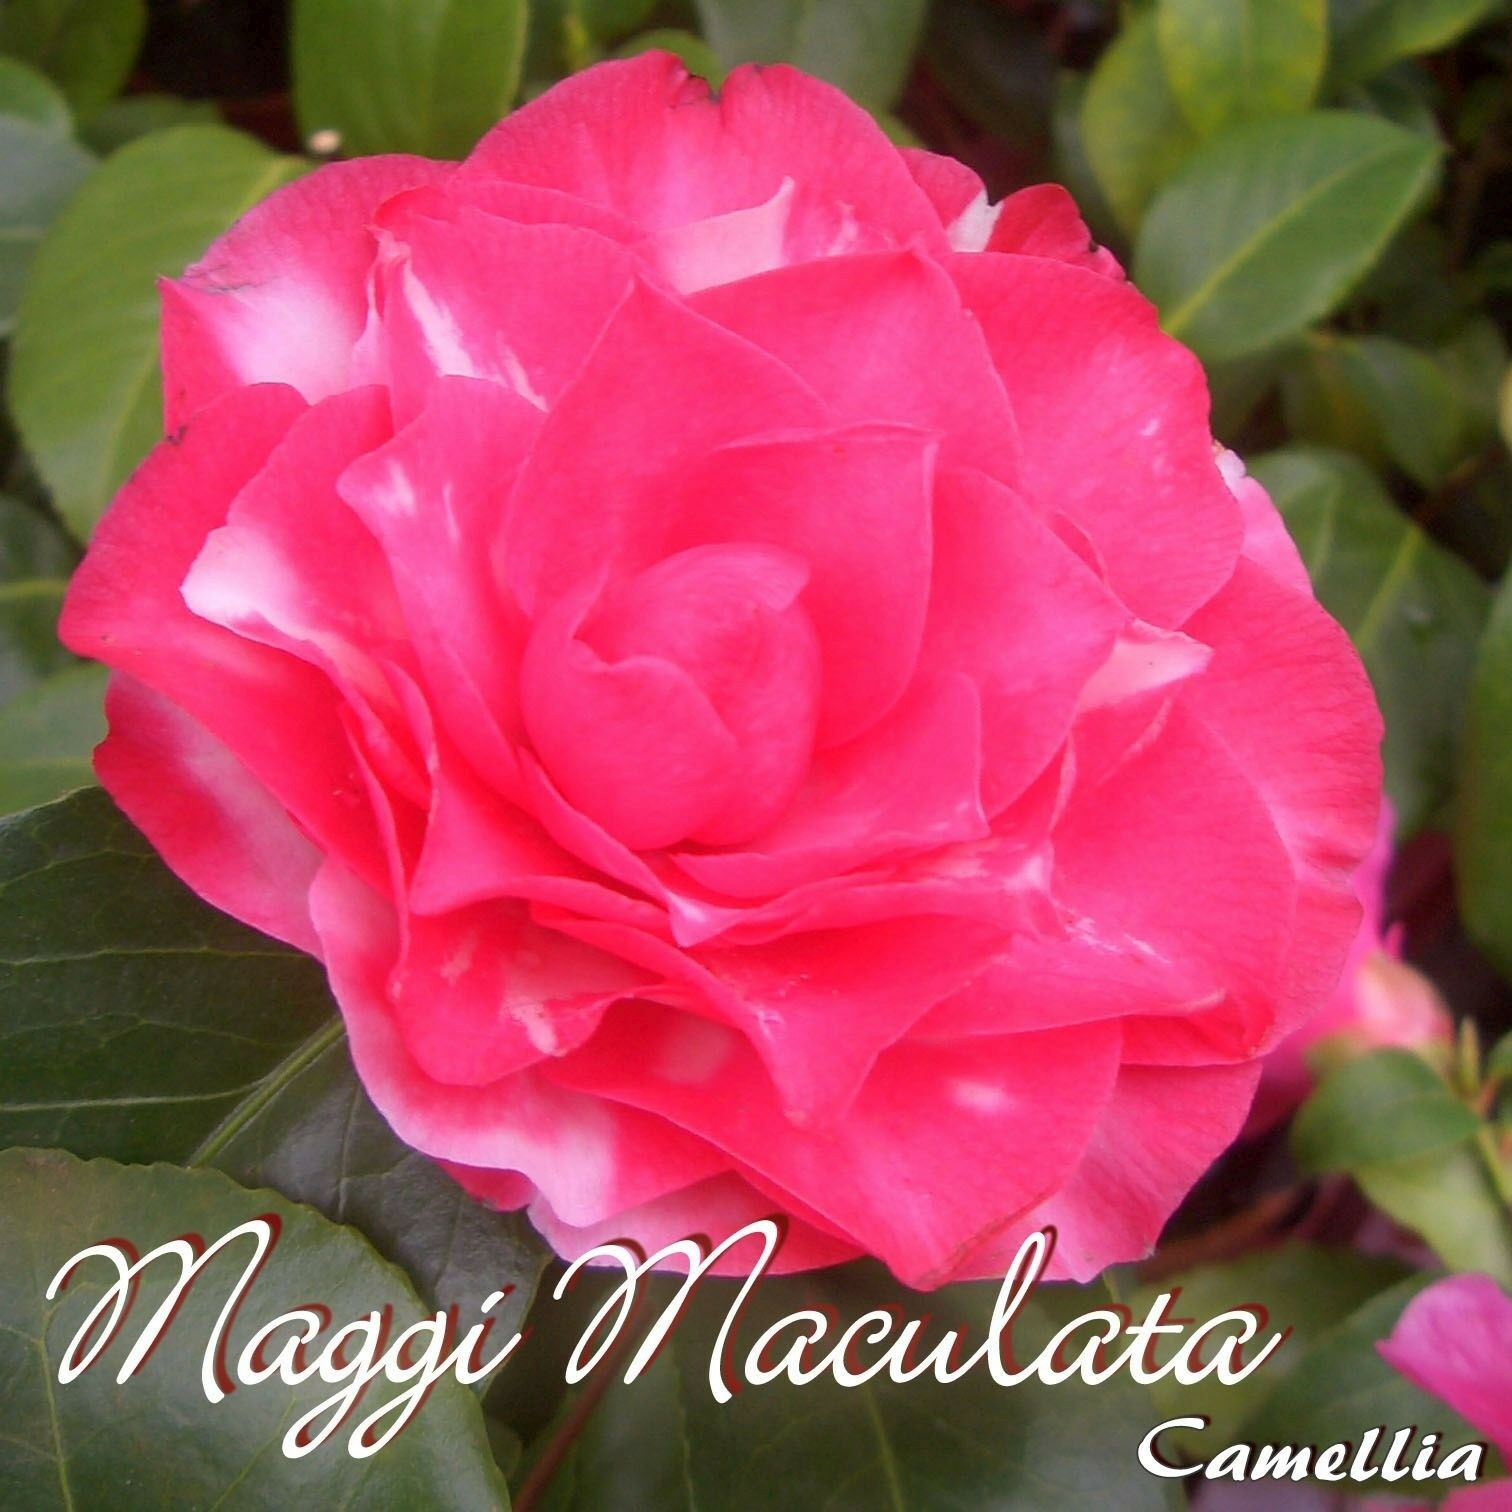 Kamelie  Maggi maculata  - Camellia - 6 a 7 anni pianta